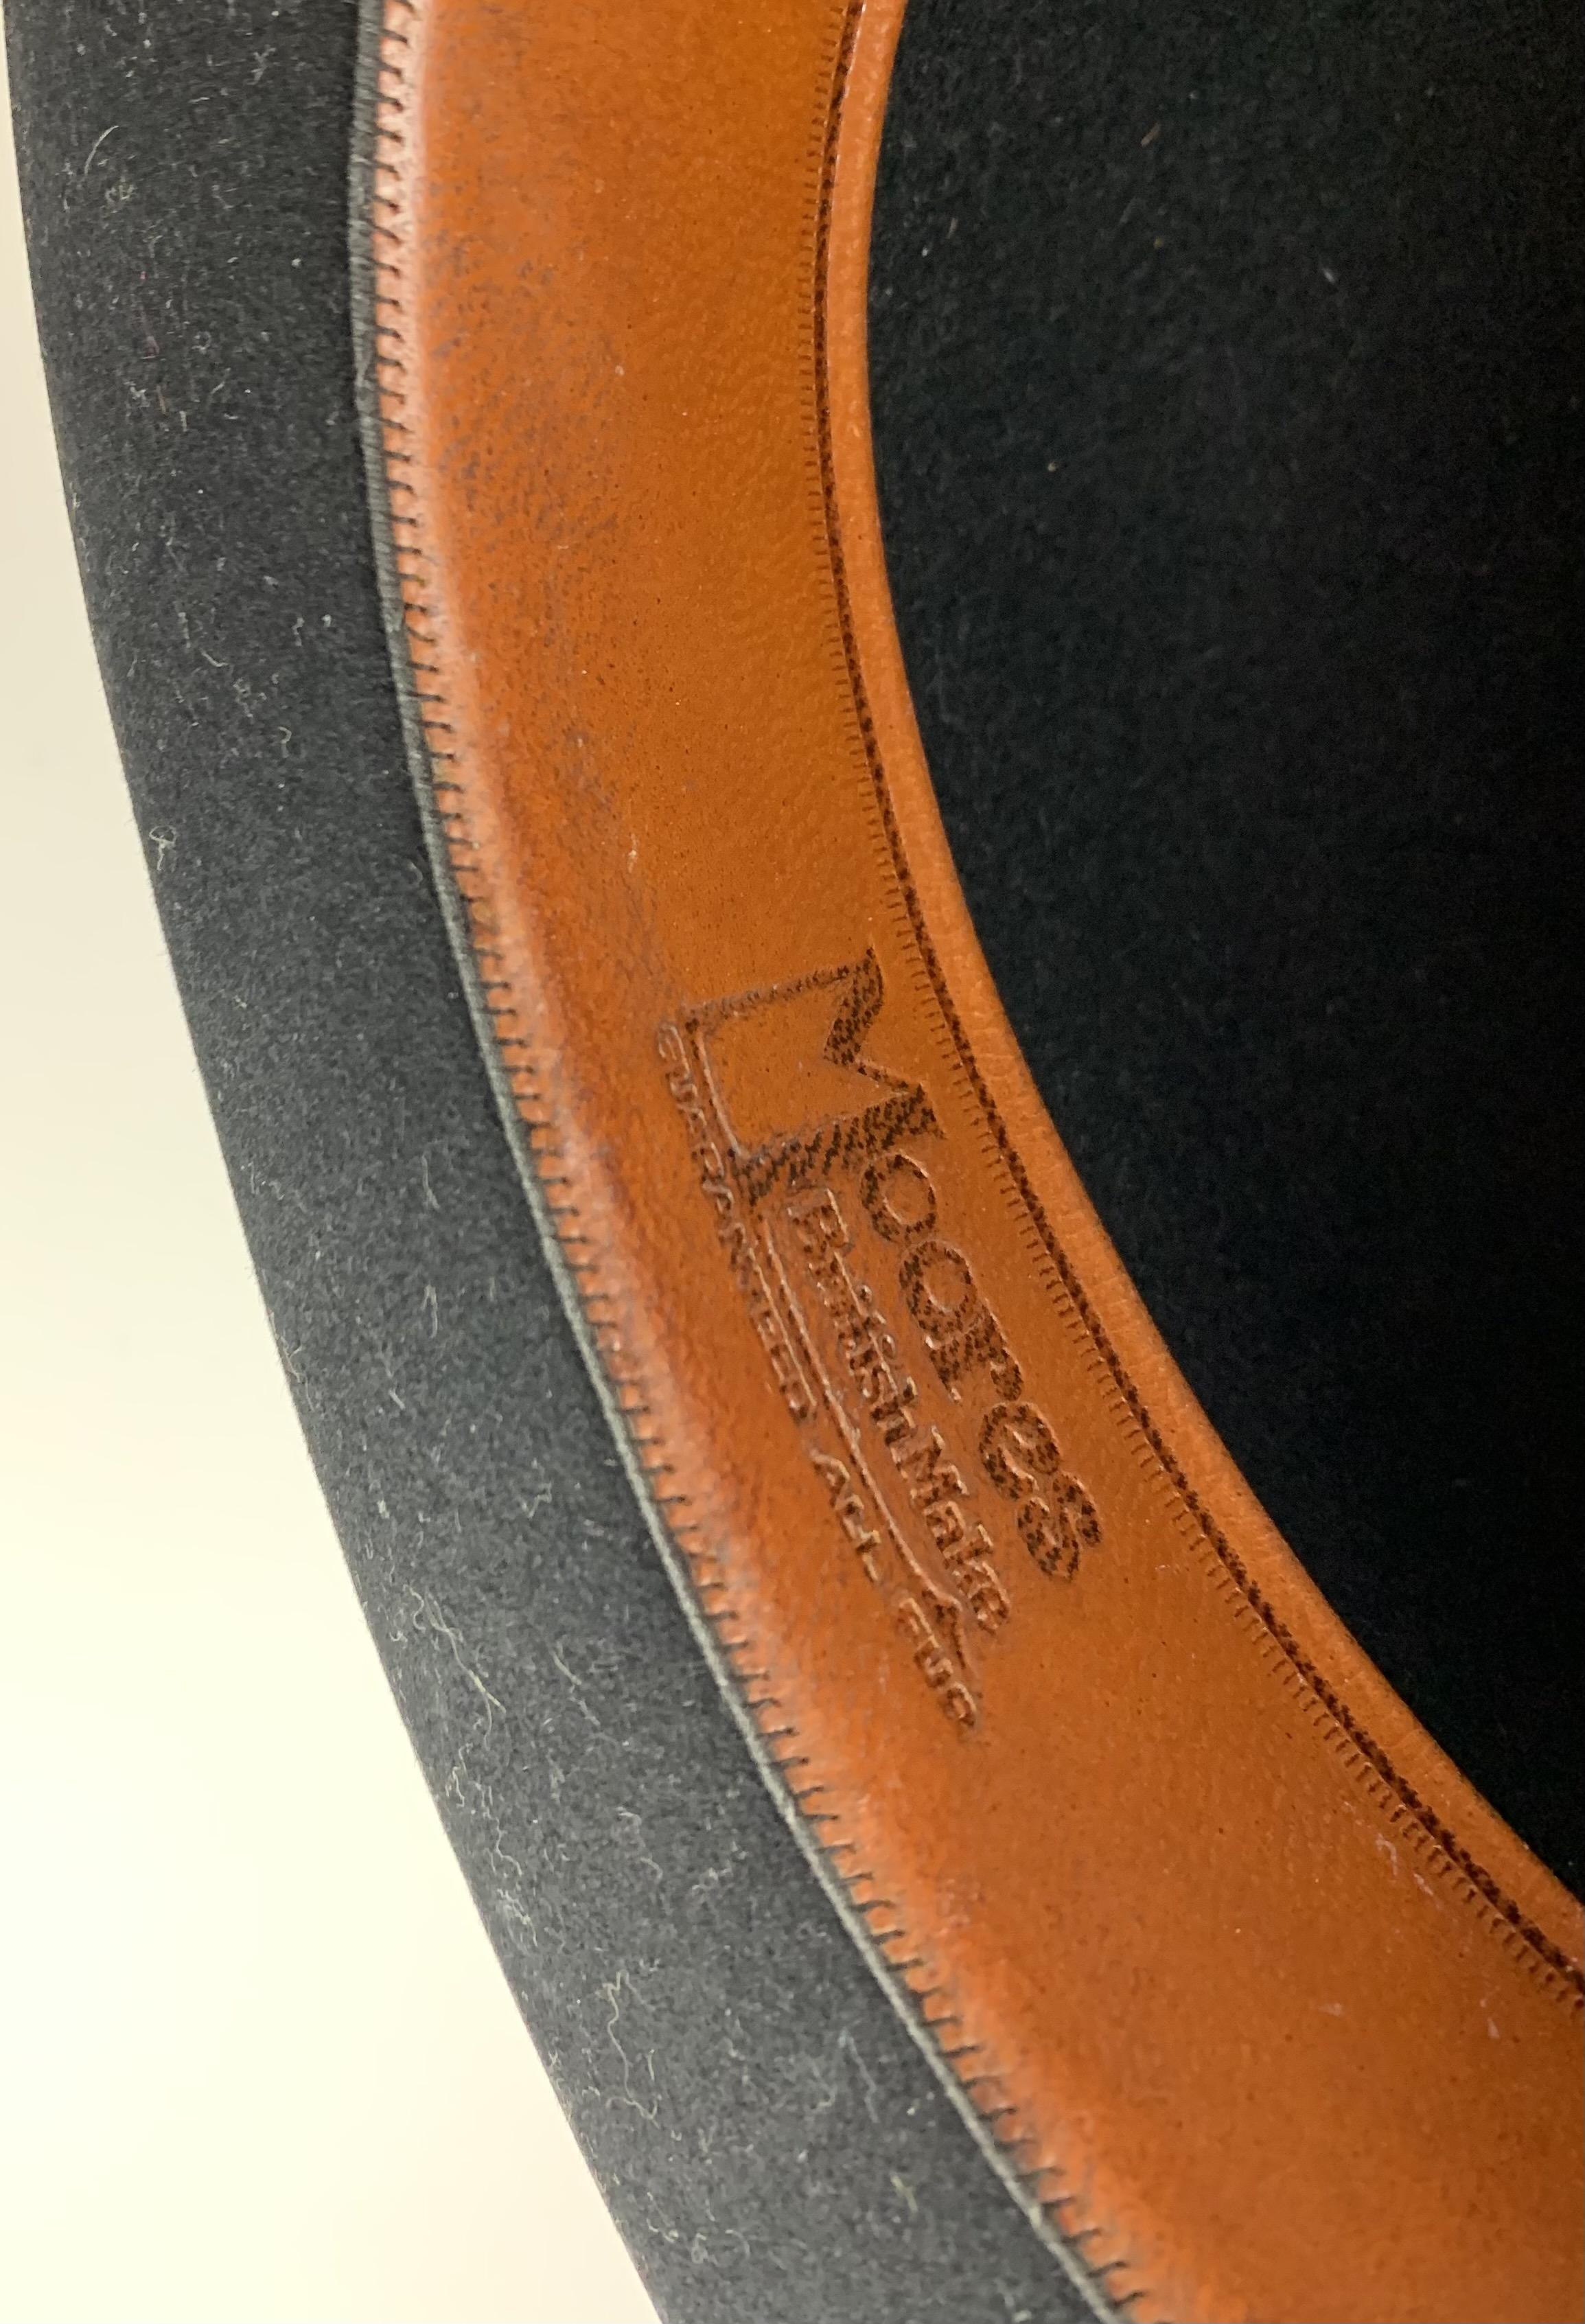 Bowler hat by John Craig, Hatter, Leeds - Image 6 of 6